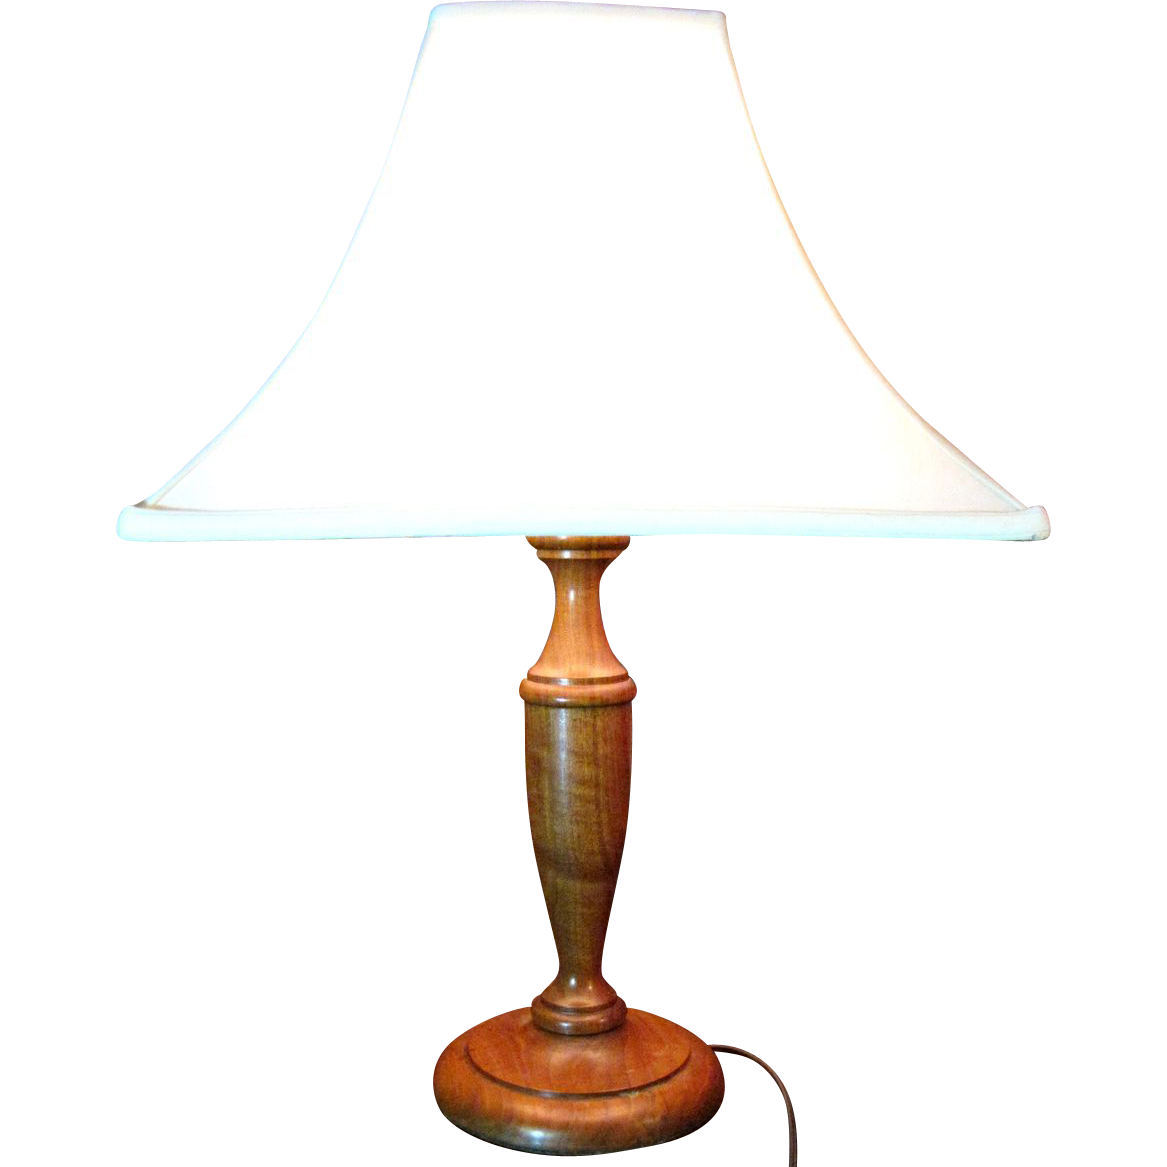 Harris turned hardwood table lamp large lovely figured wood harris turned hardwood table lamp large lovely figured wood geotapseo Images